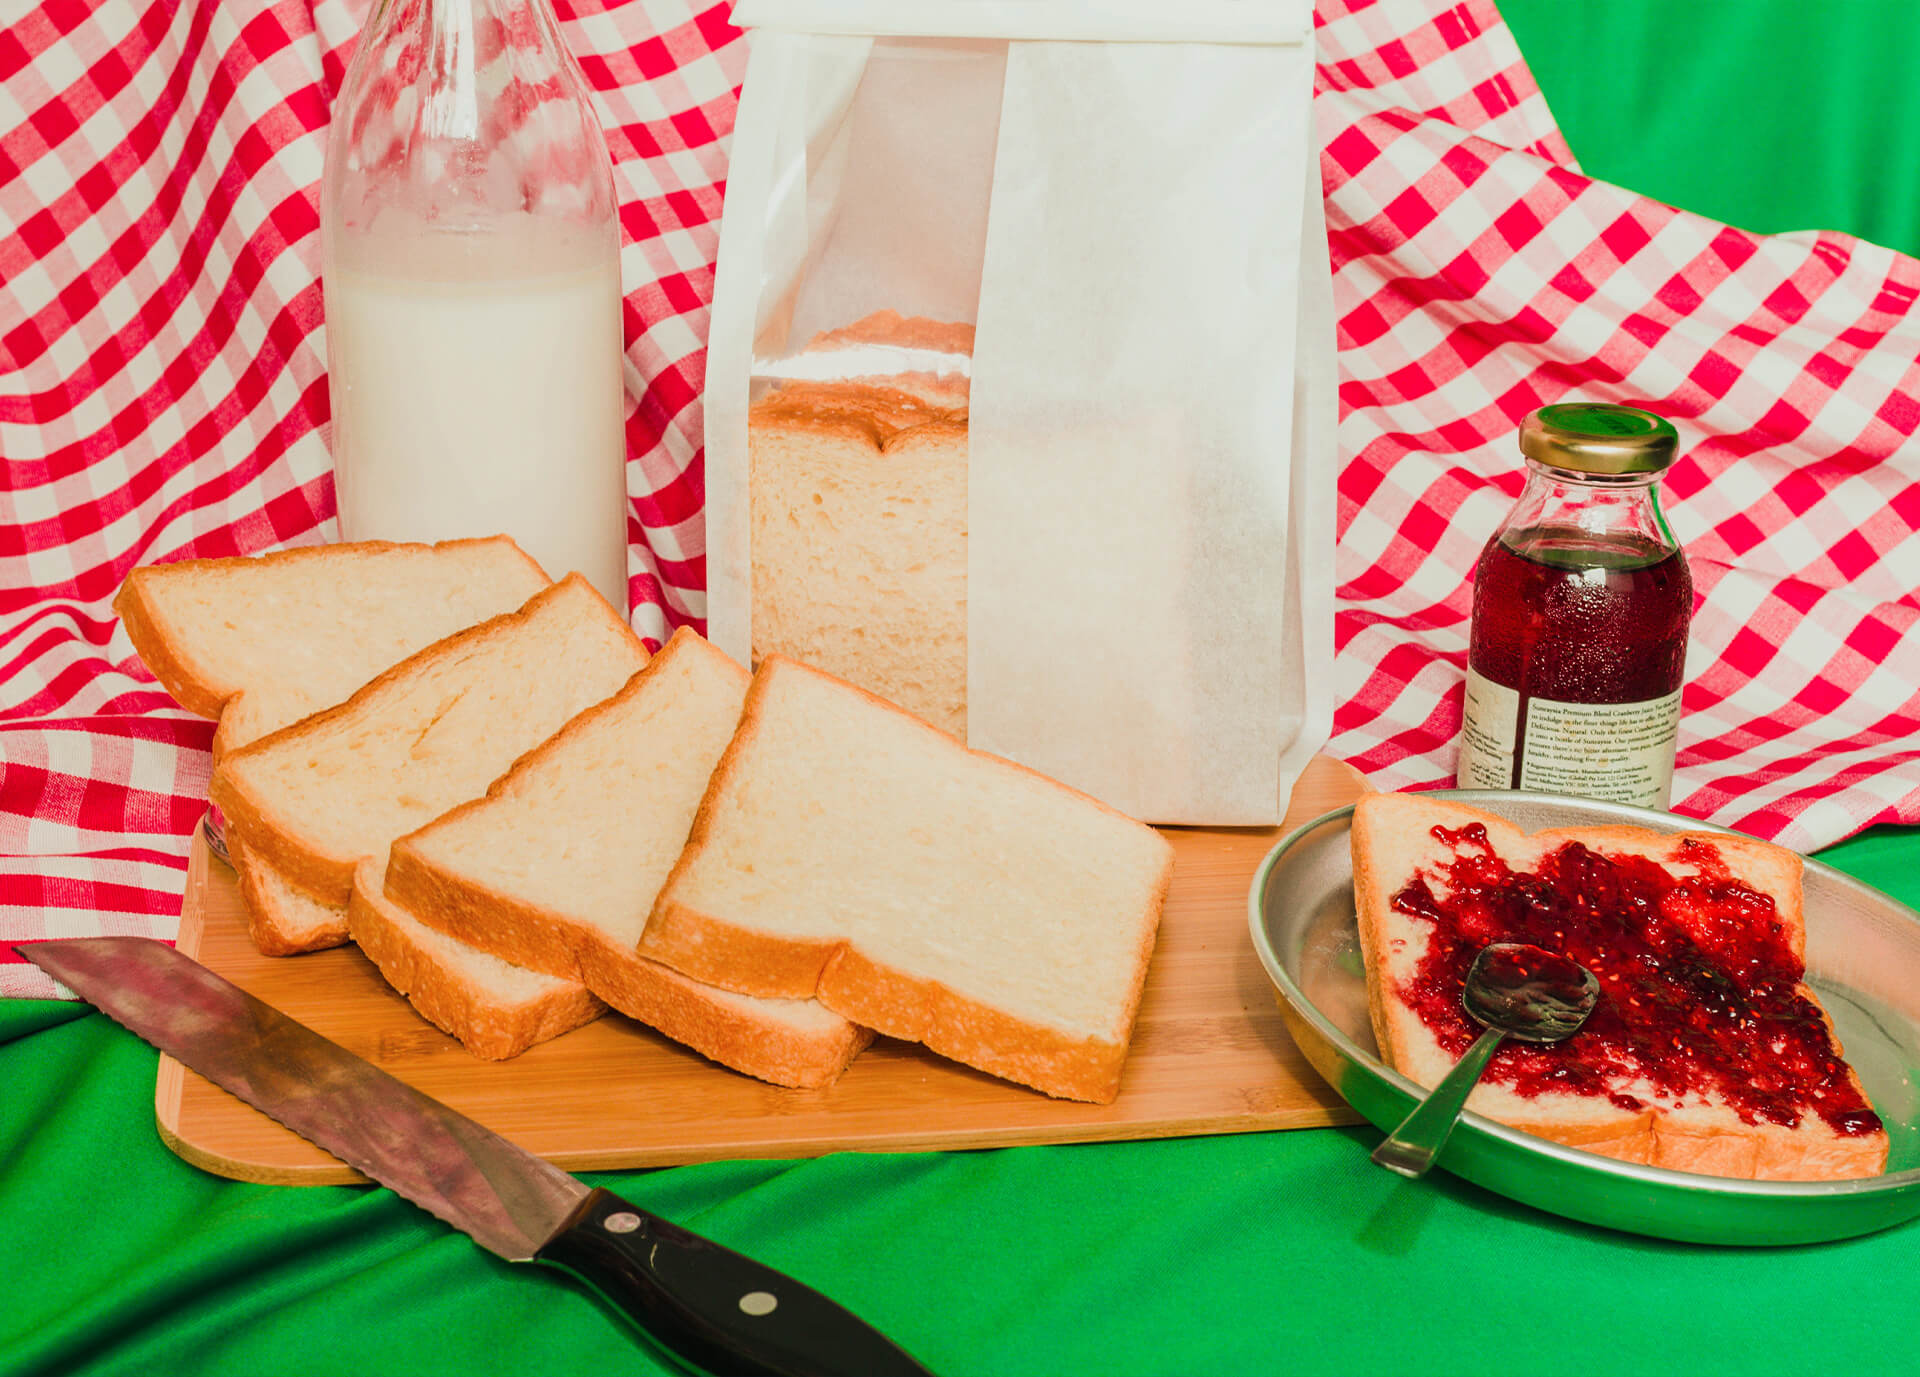 Breakfast toast with jam and milk